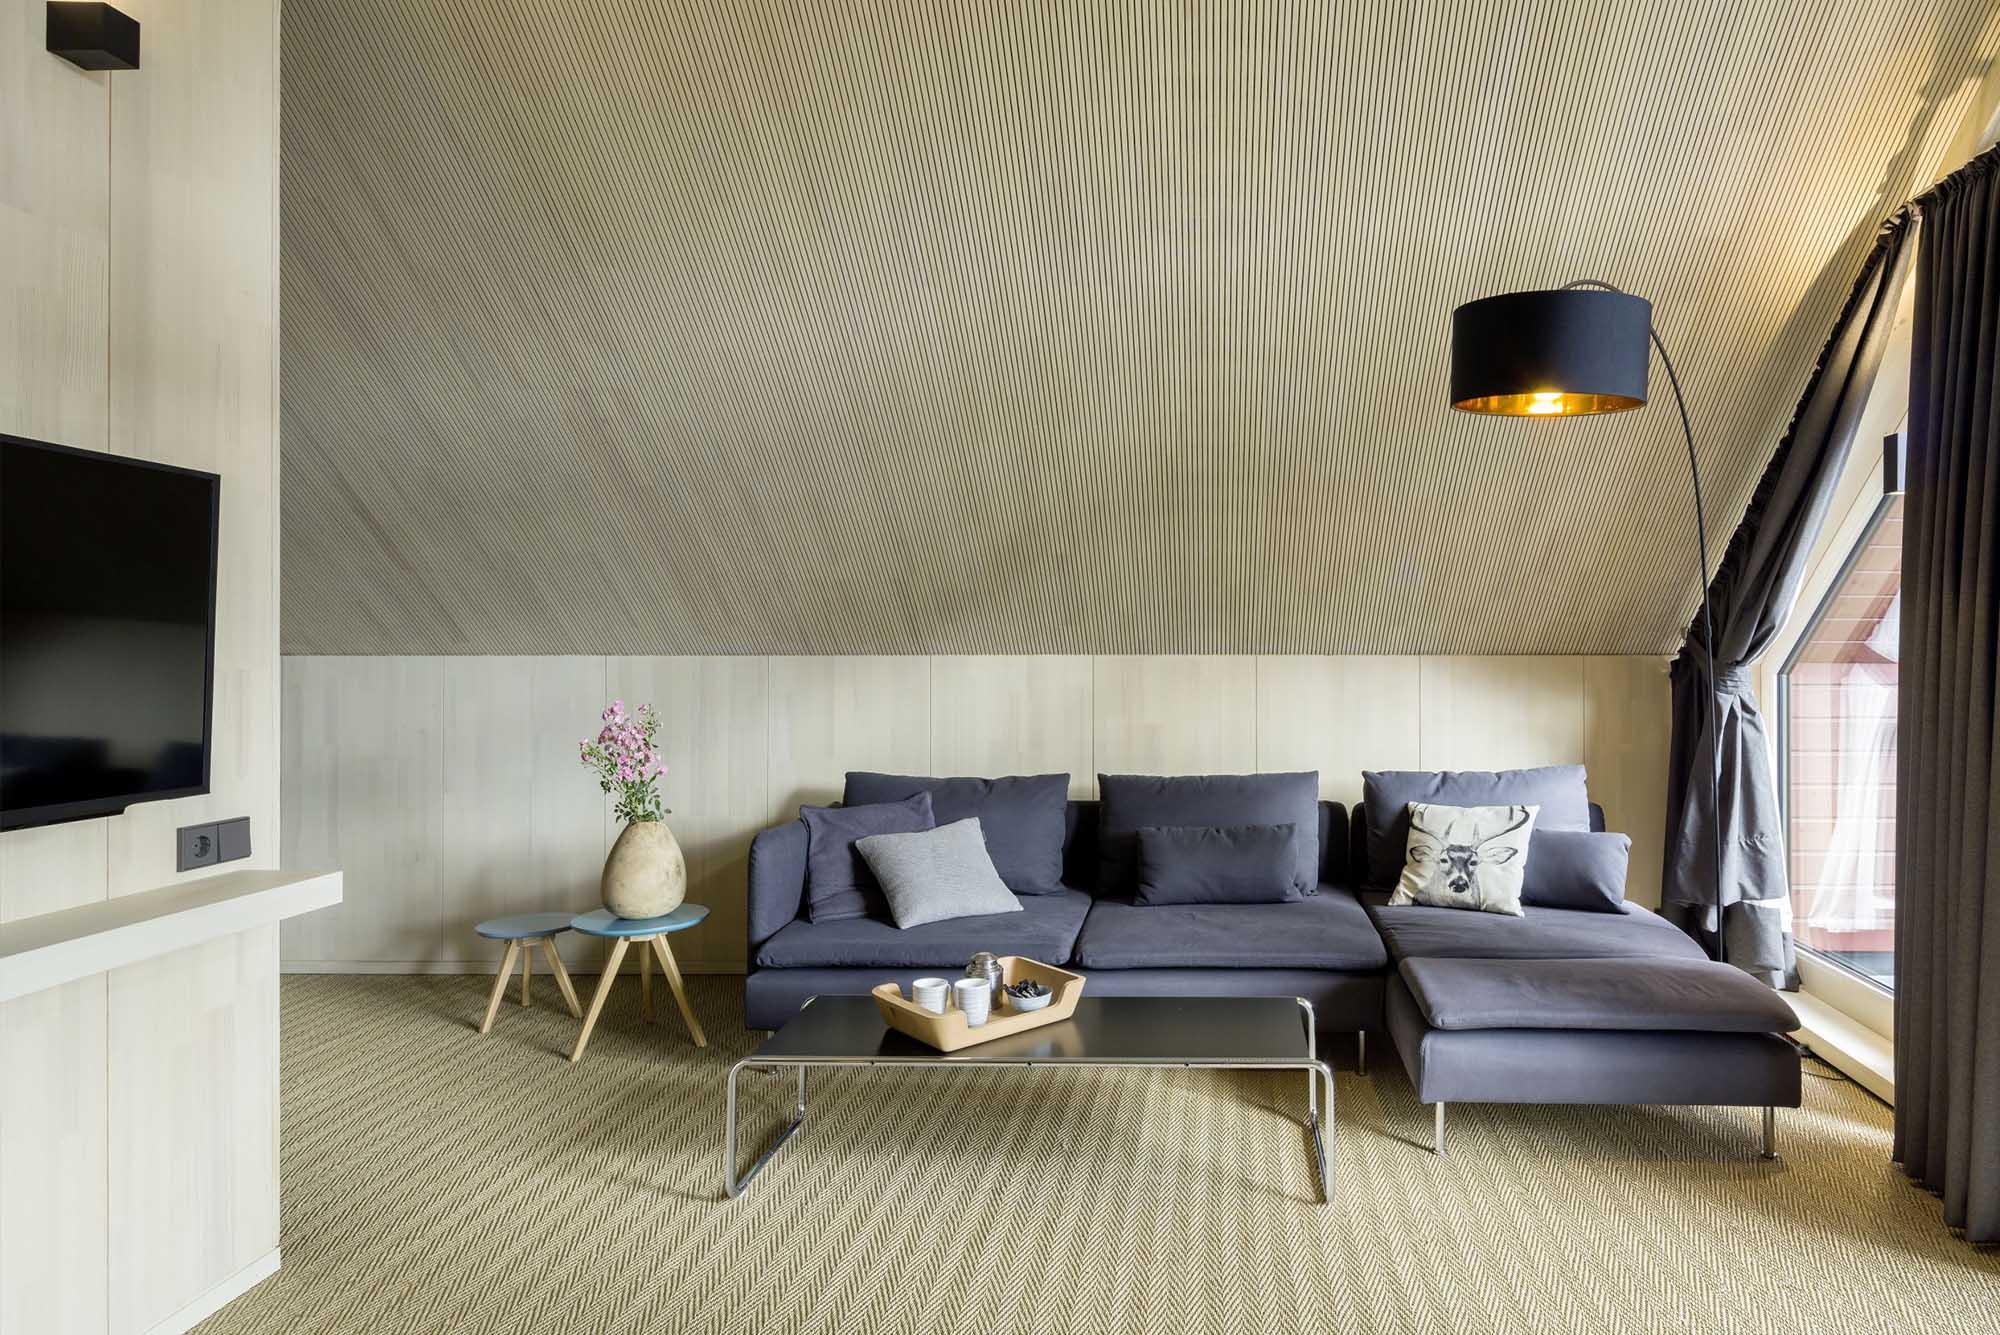 Hotel in Holzbauweise| Klimaholzhaus | Golflodge Schloss Auel ...